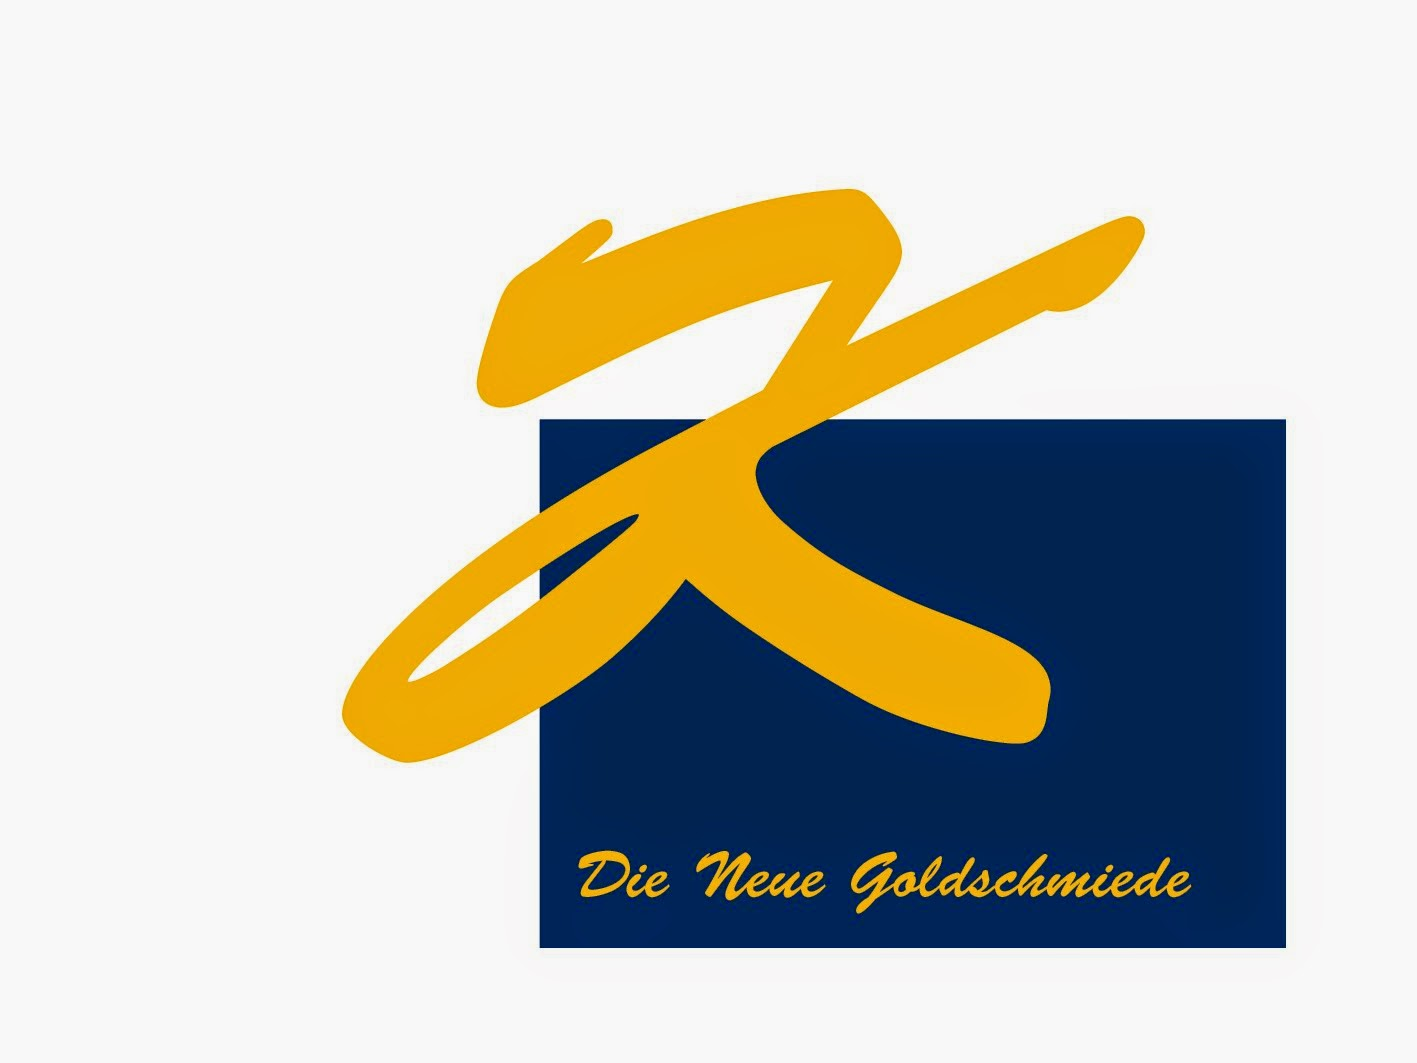 Die Neue Goldschmiede